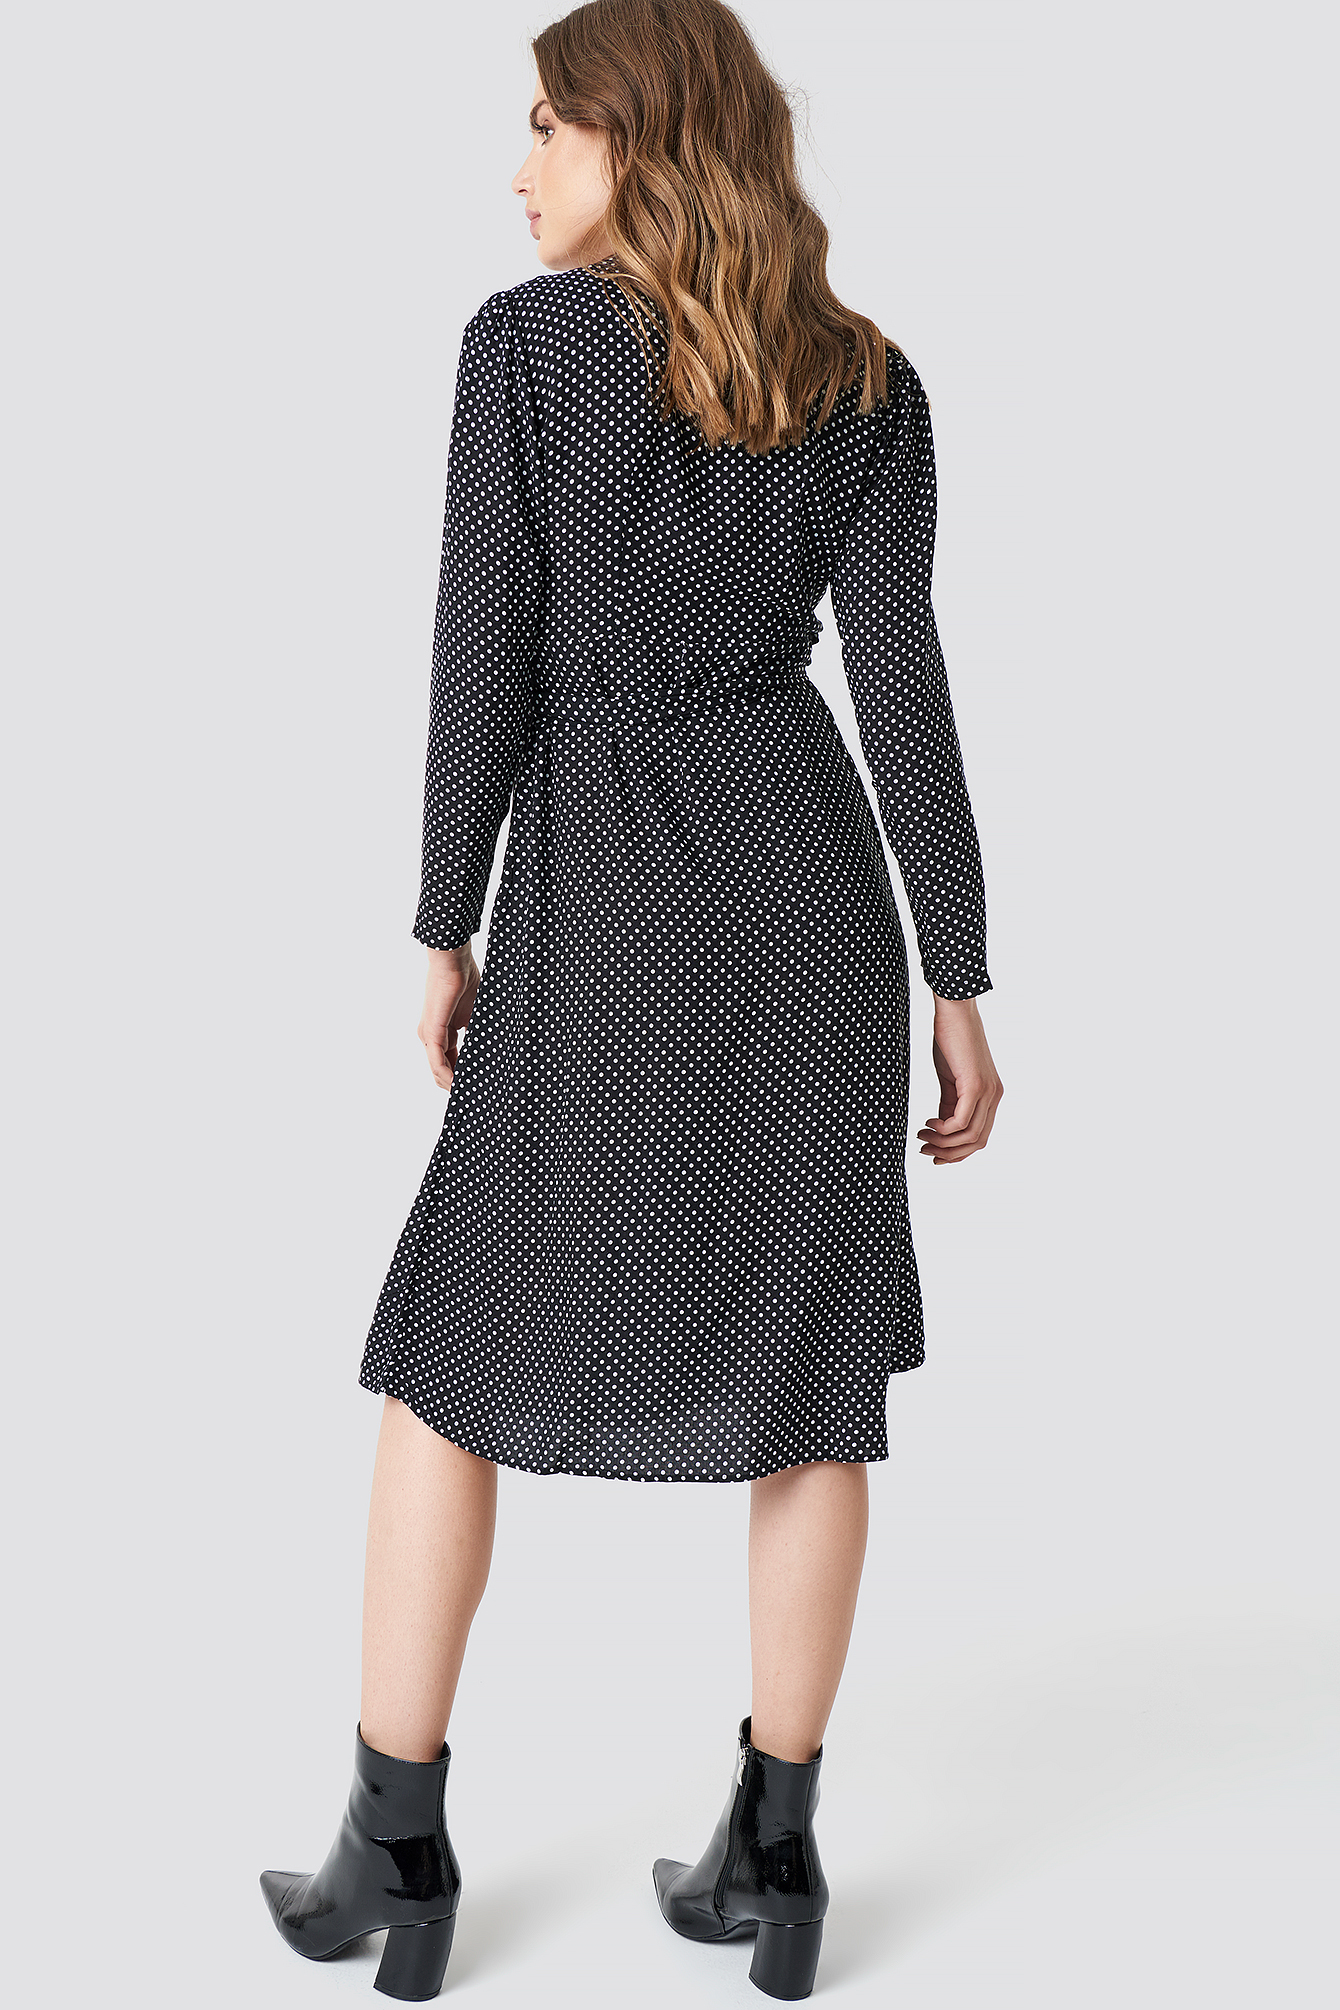 Wrap Around Dotted Dress NA-KD.COM